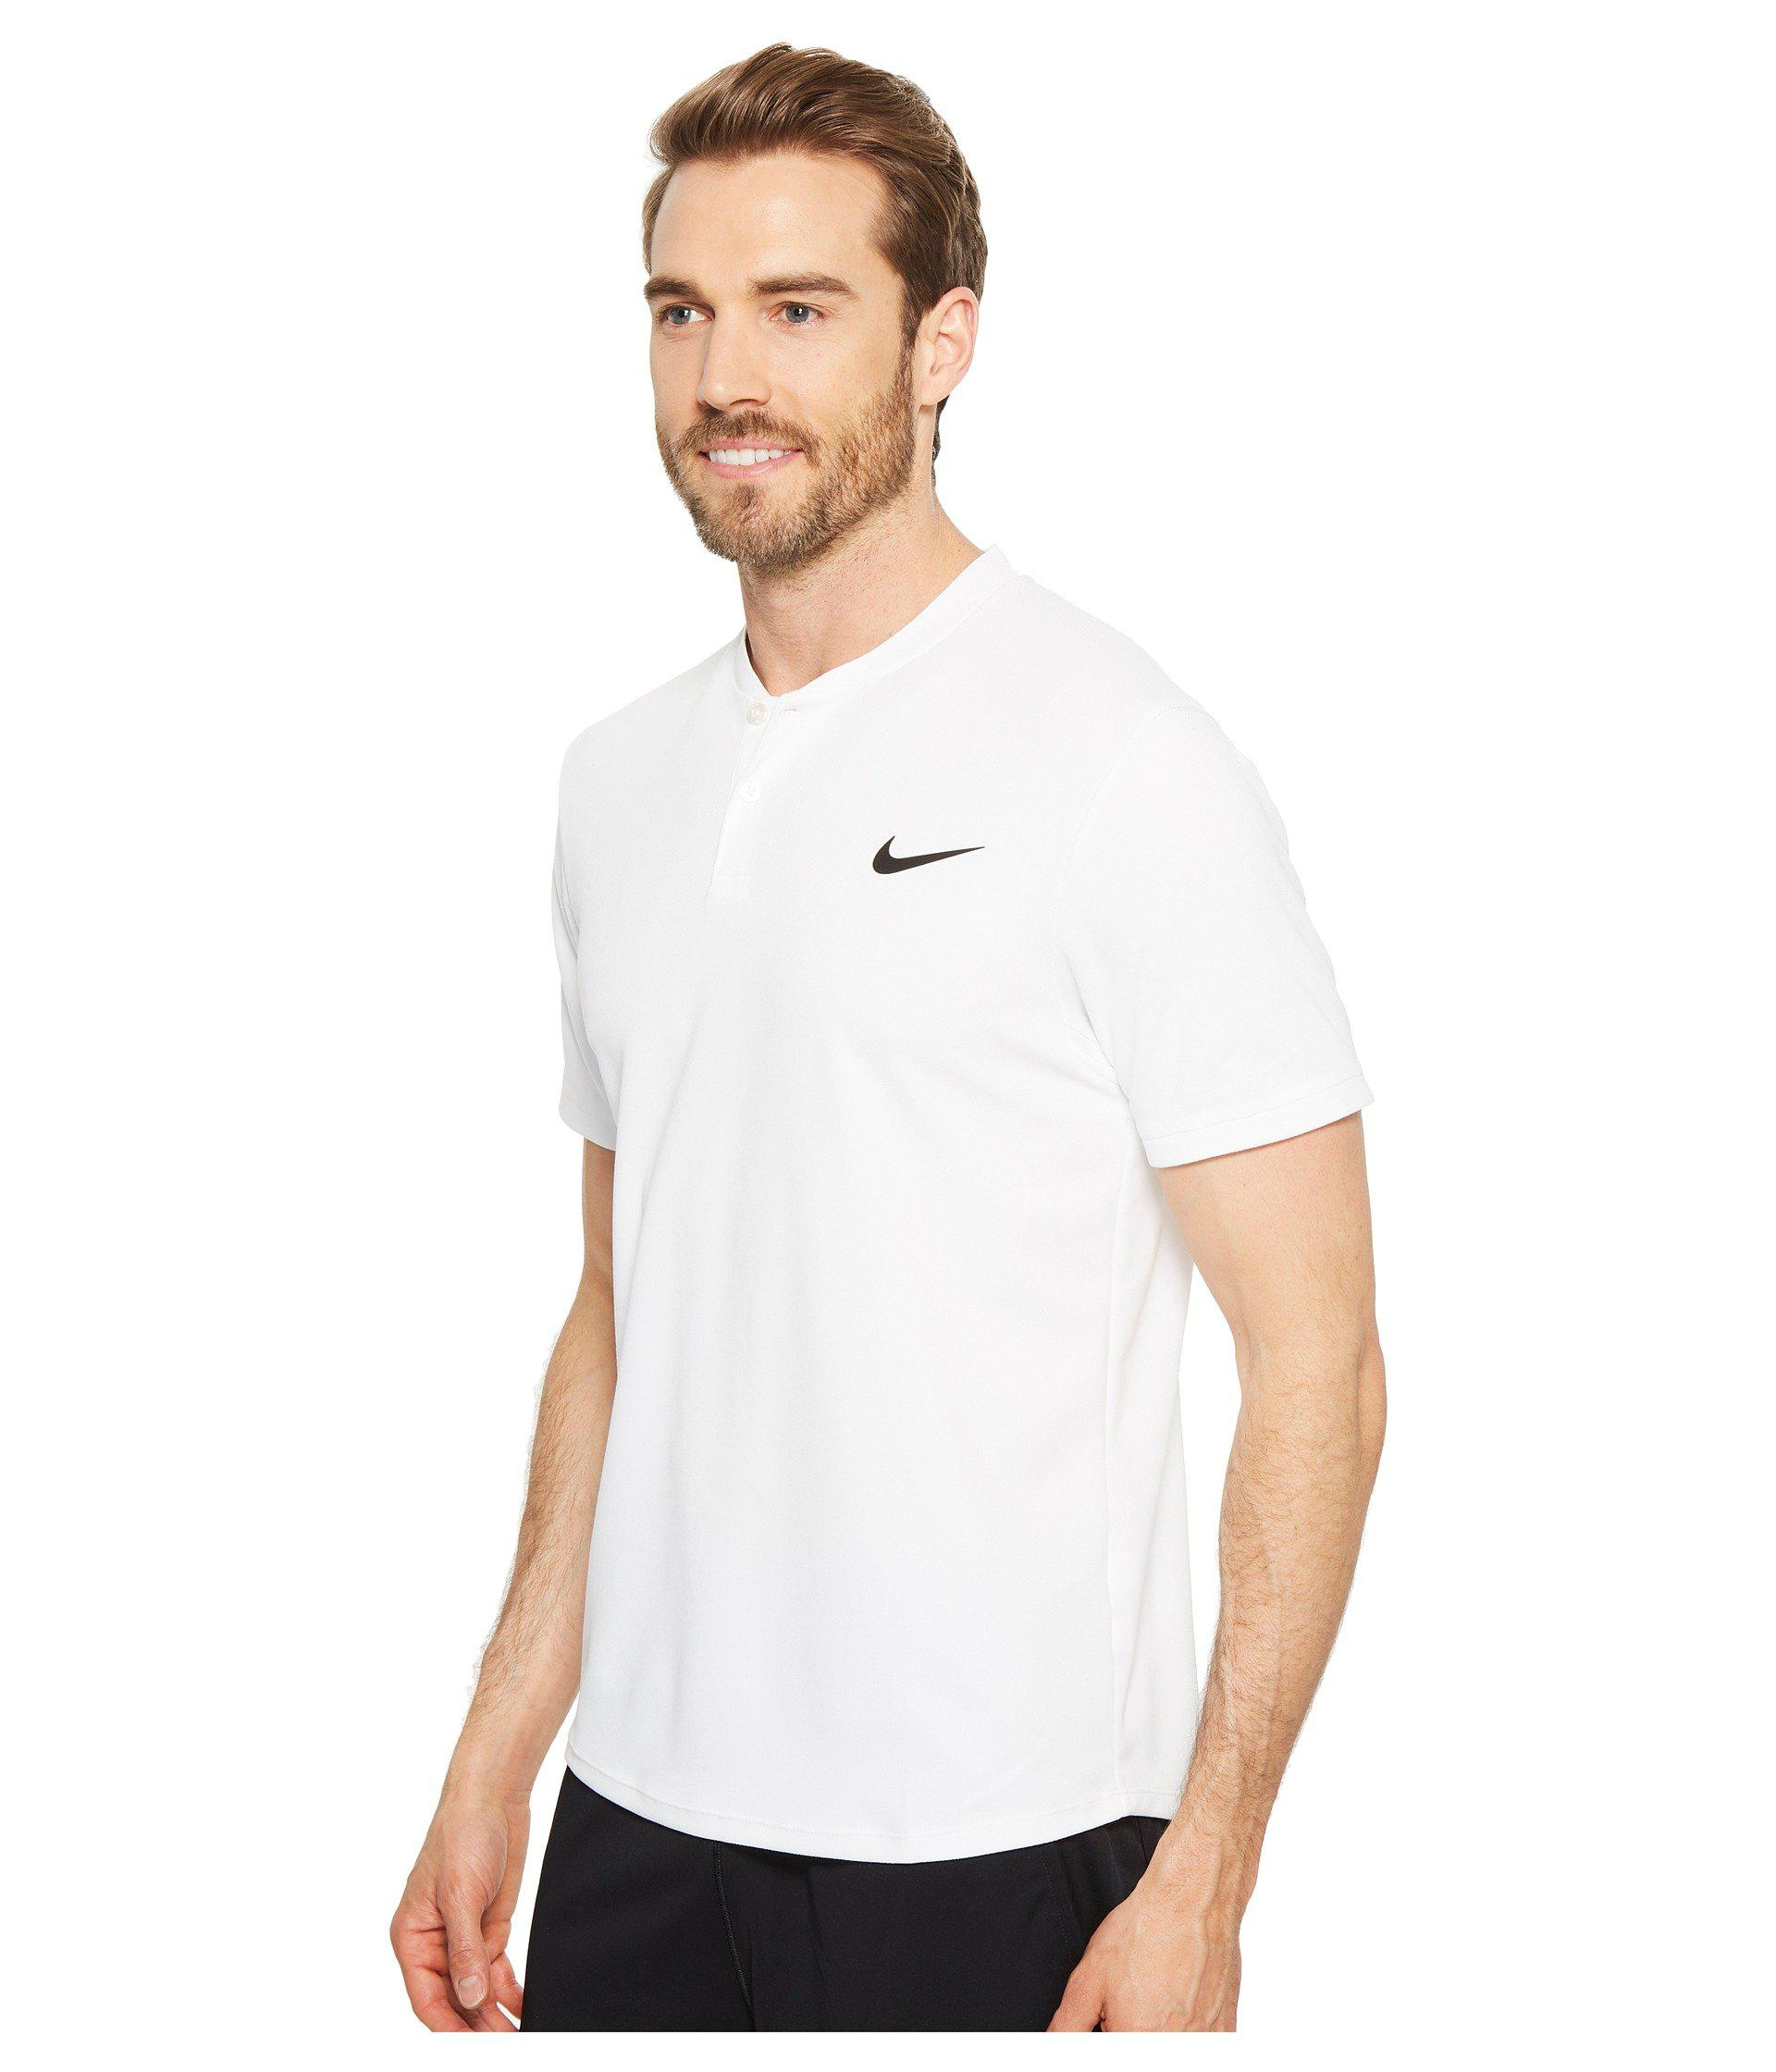 ec9a3f9c Nike Tennis T Shirts Mens - DREAMWORKS